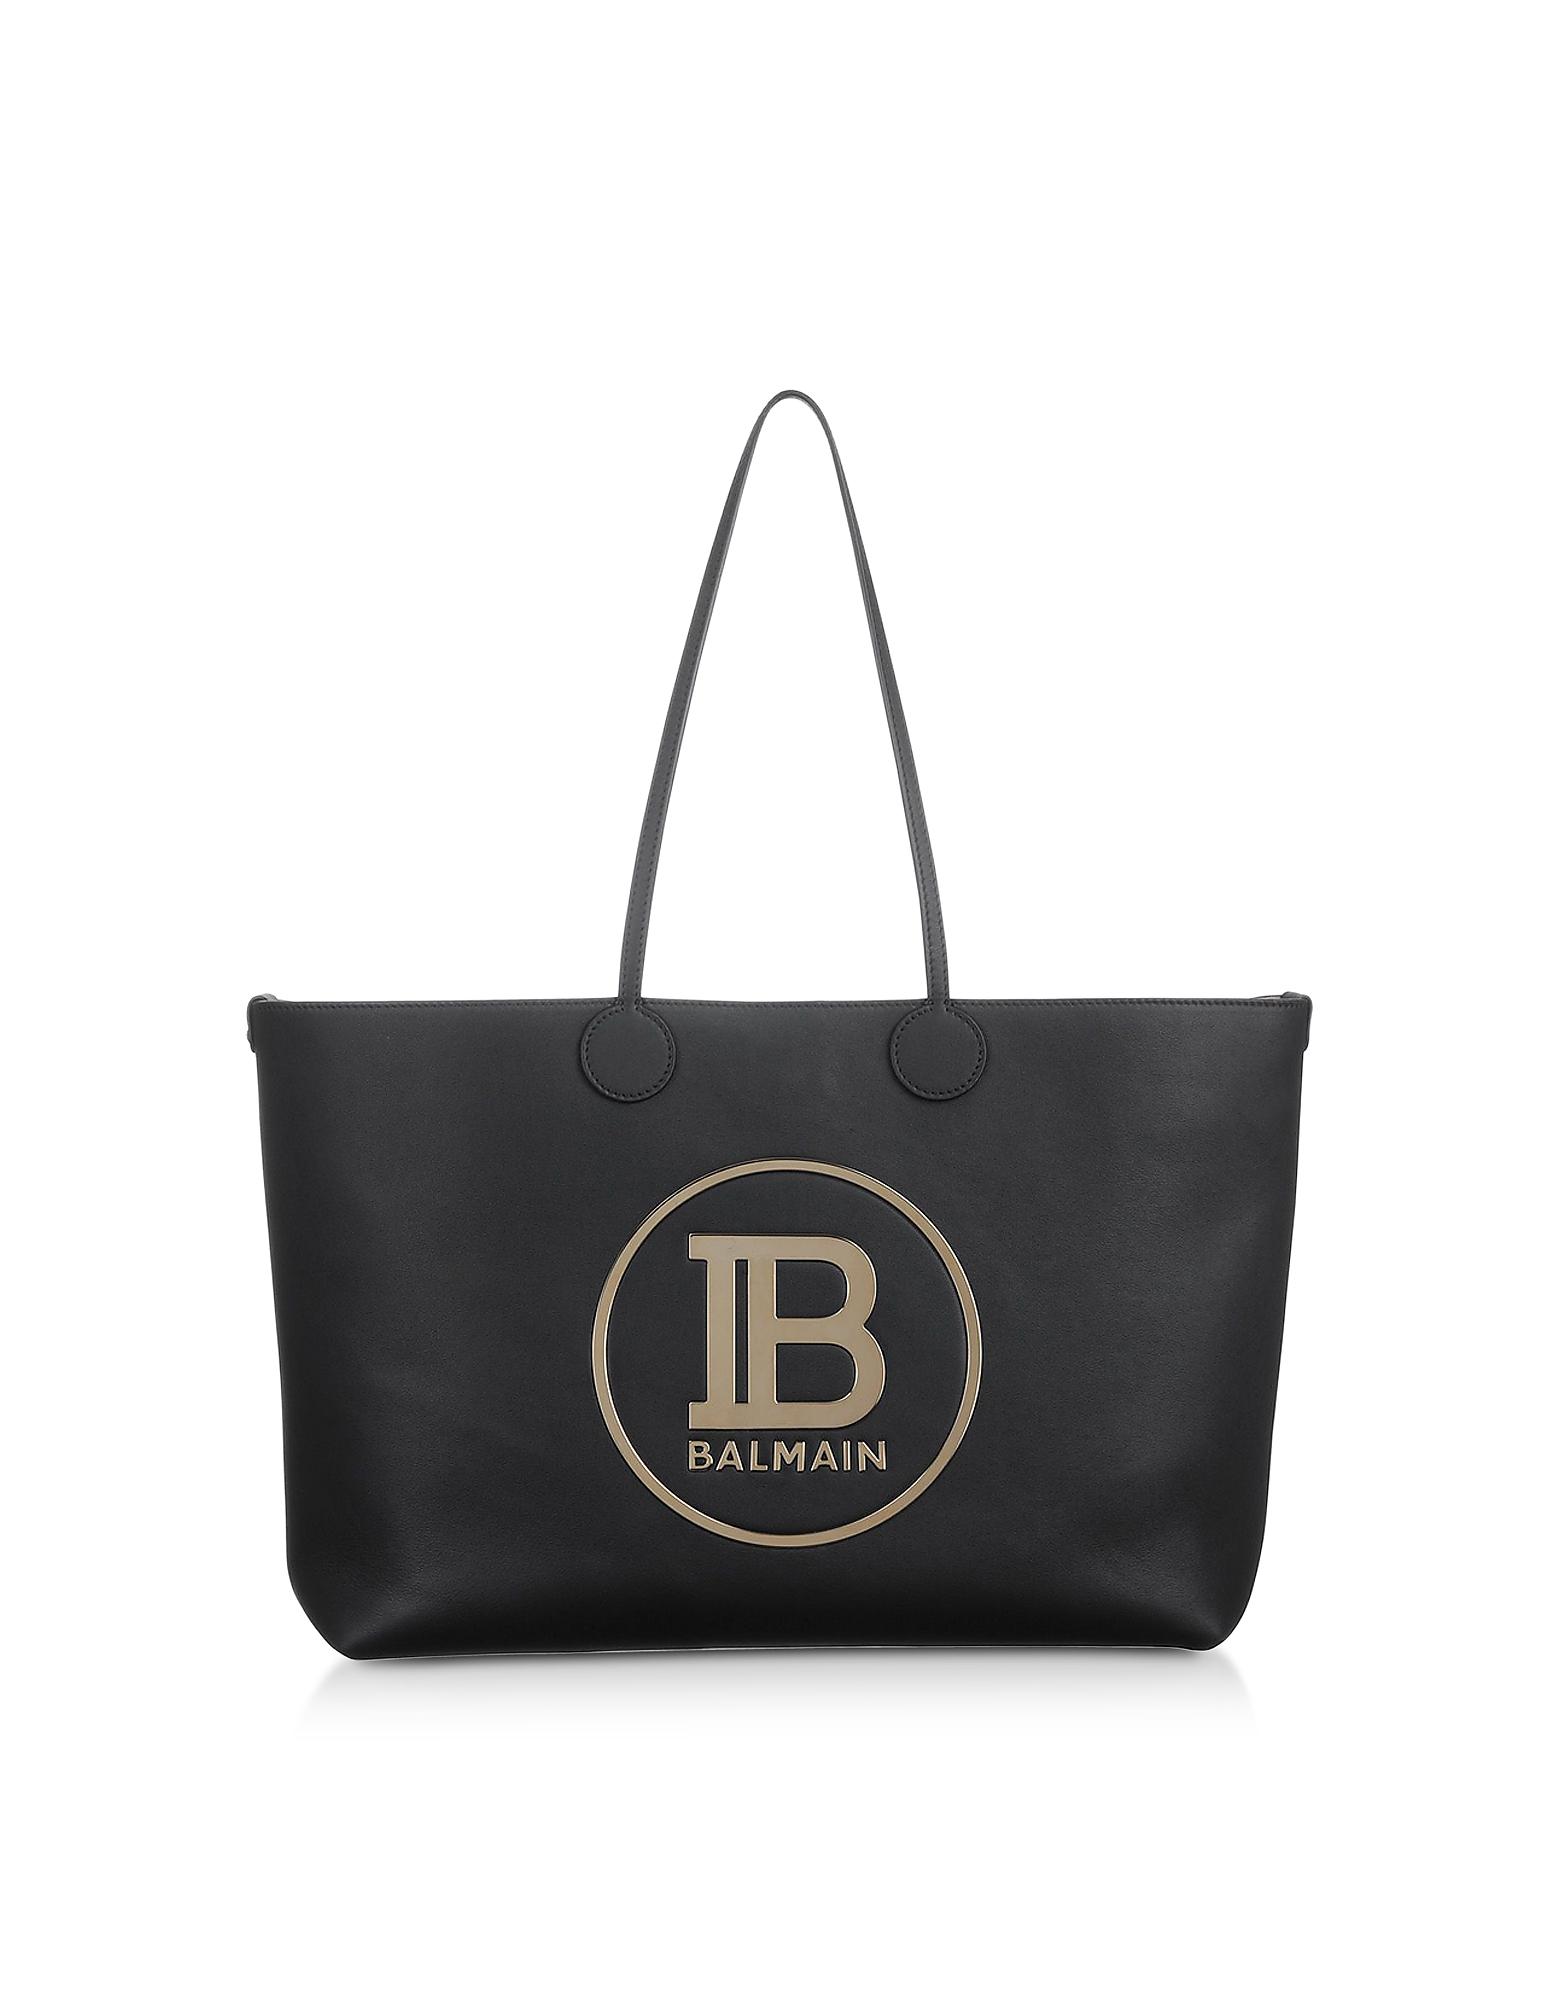 Medium Black & Gold Leather Tote Bag